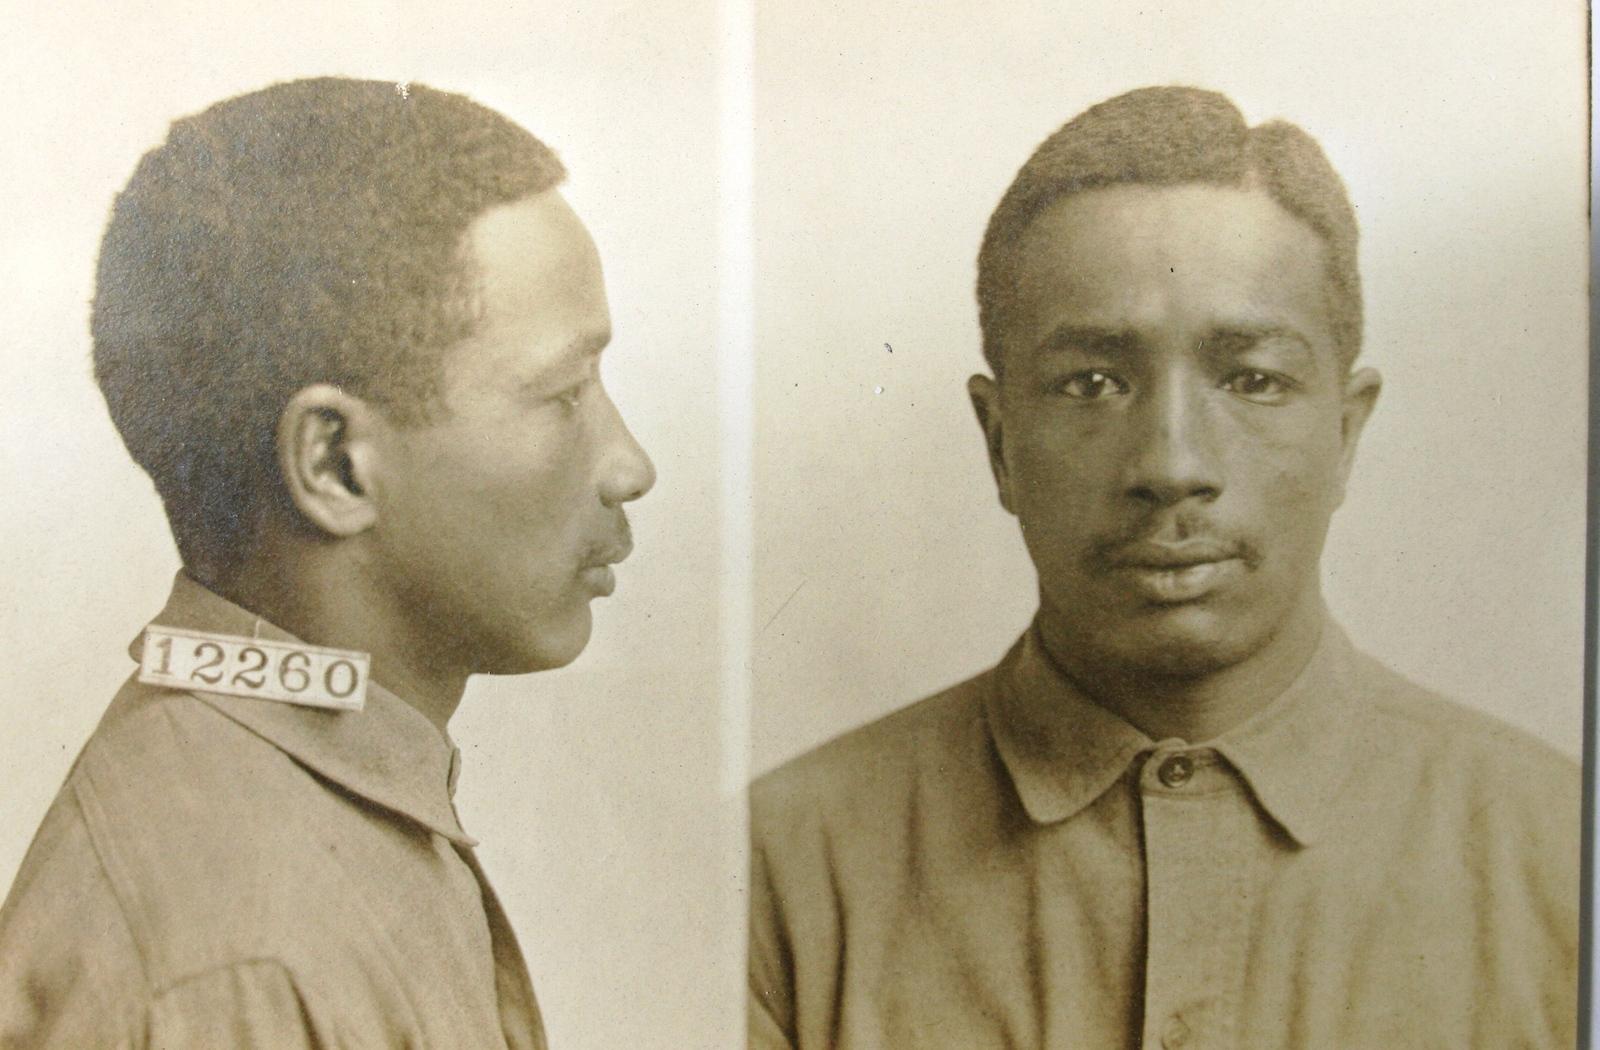 Photograph of Norman B. Holland